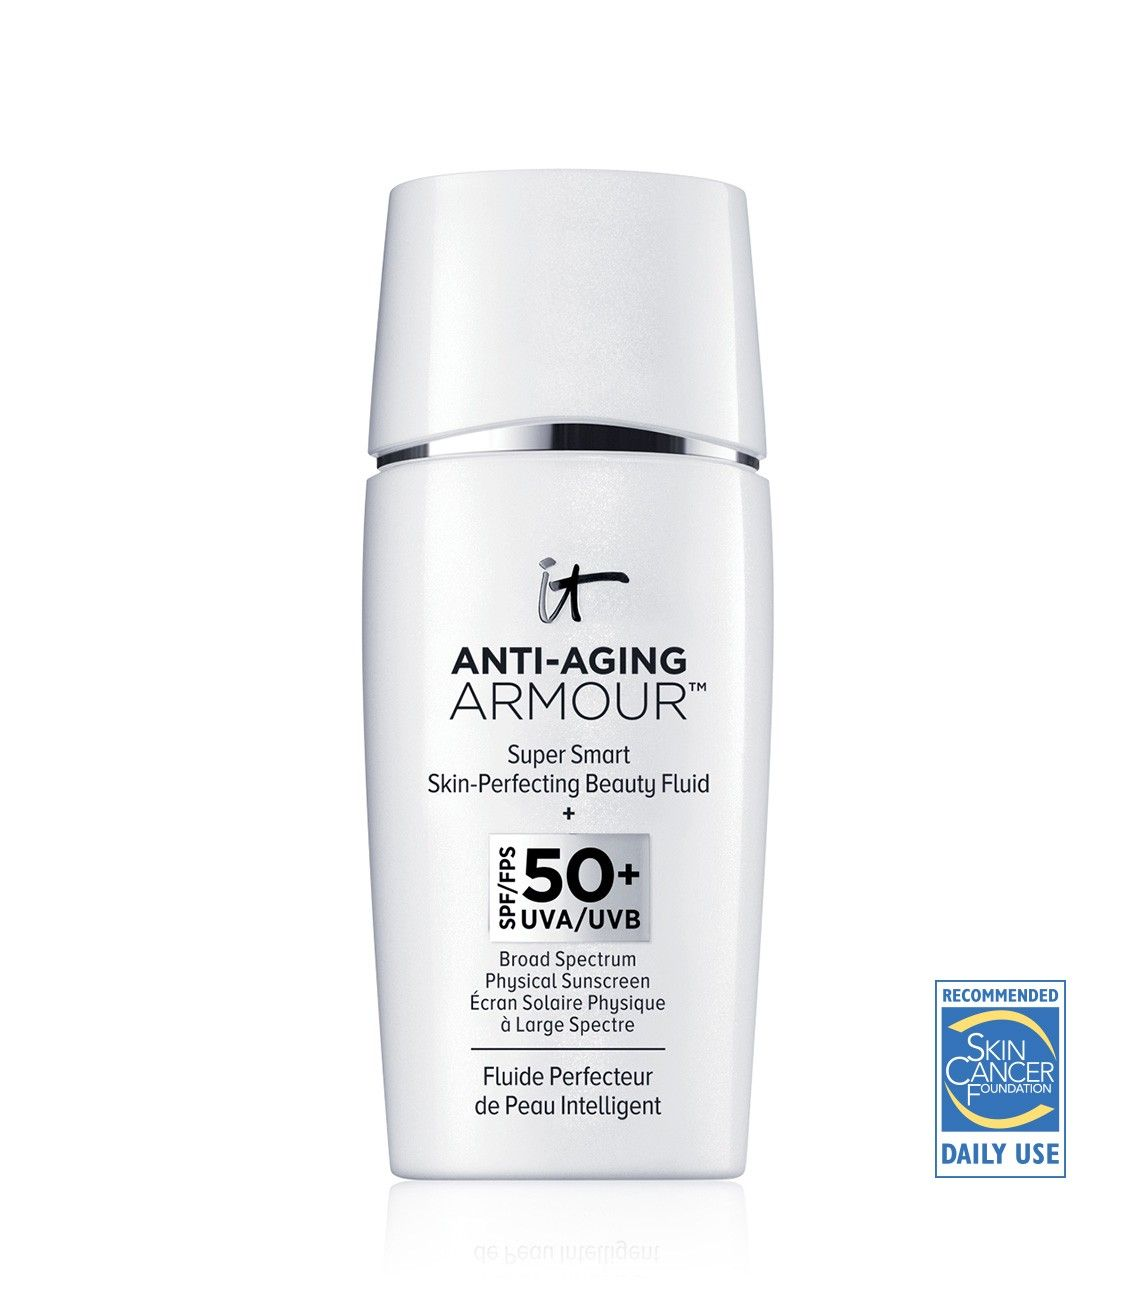 Super Smart Skin-Perfecting Beauty Fluid + SPF 50+ UVA/UVB Broad Spectrum Physical Sunscreen